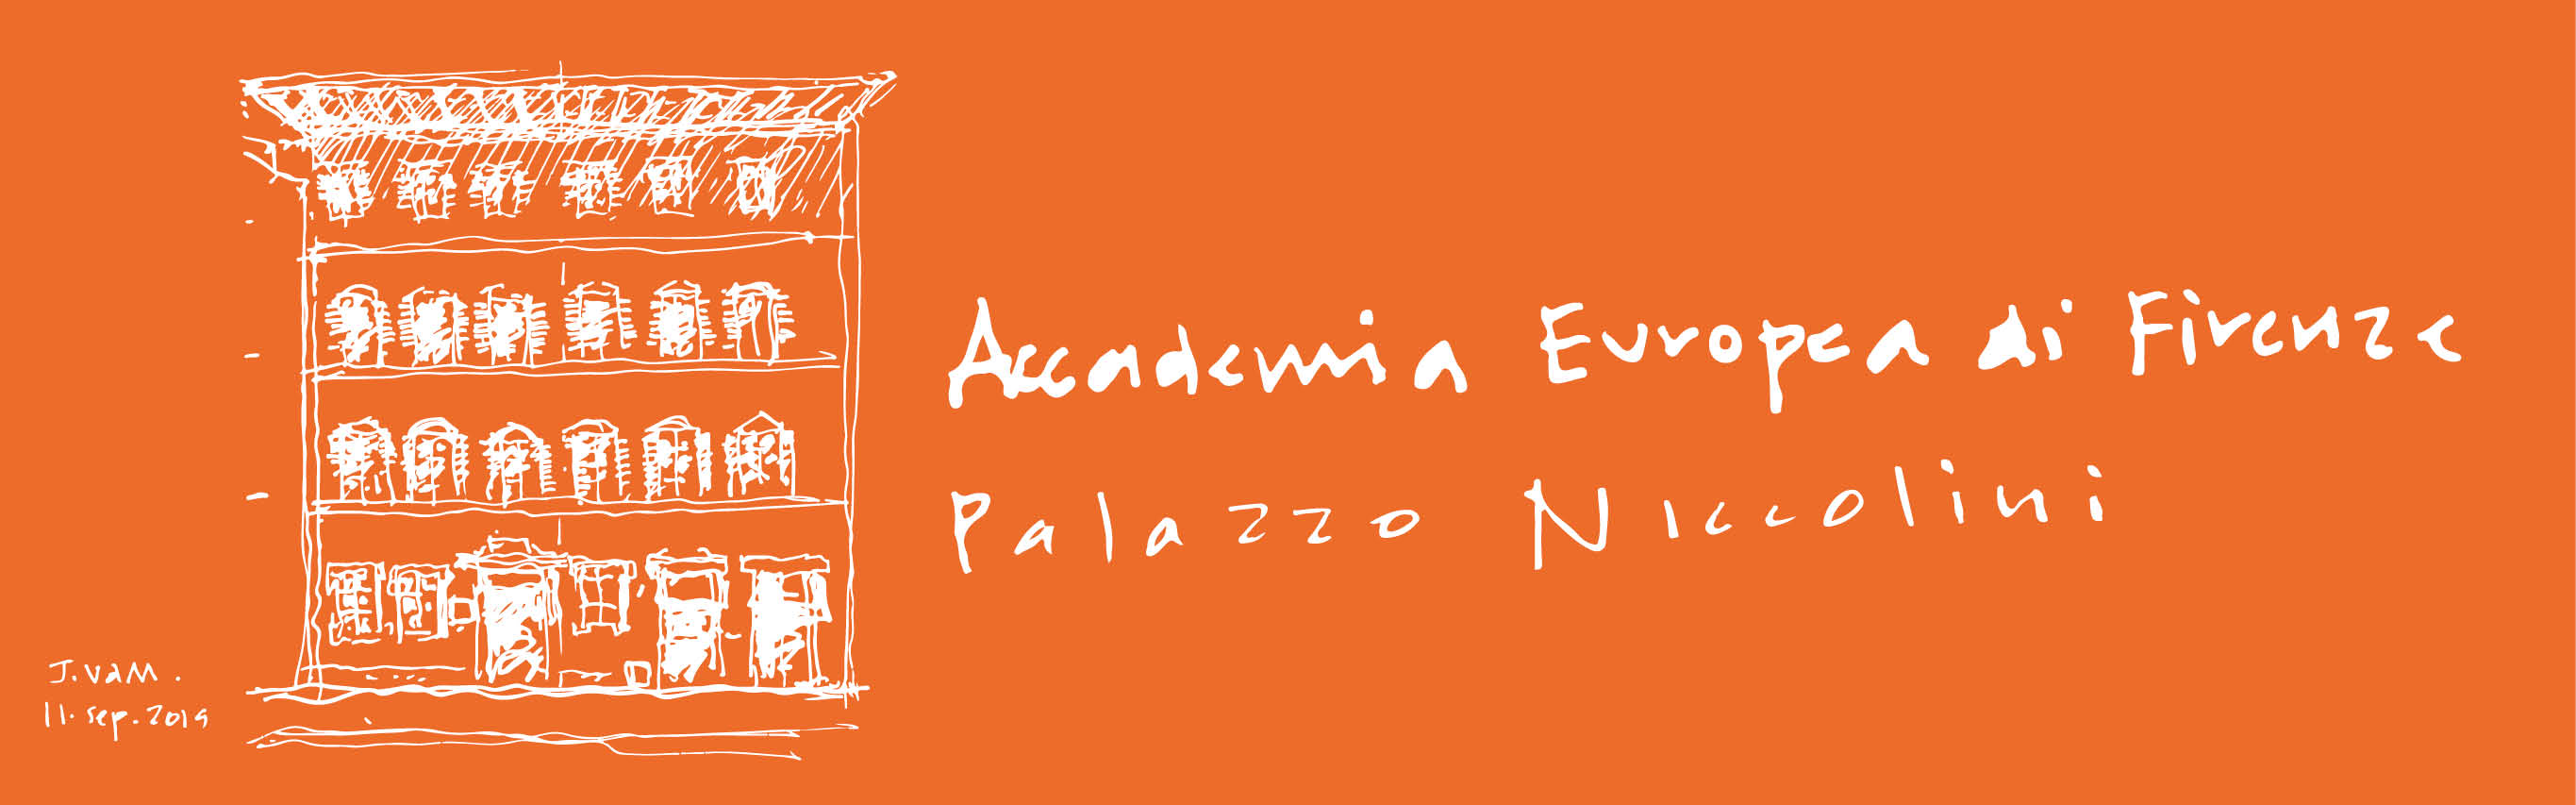 PalazzoNiccolini